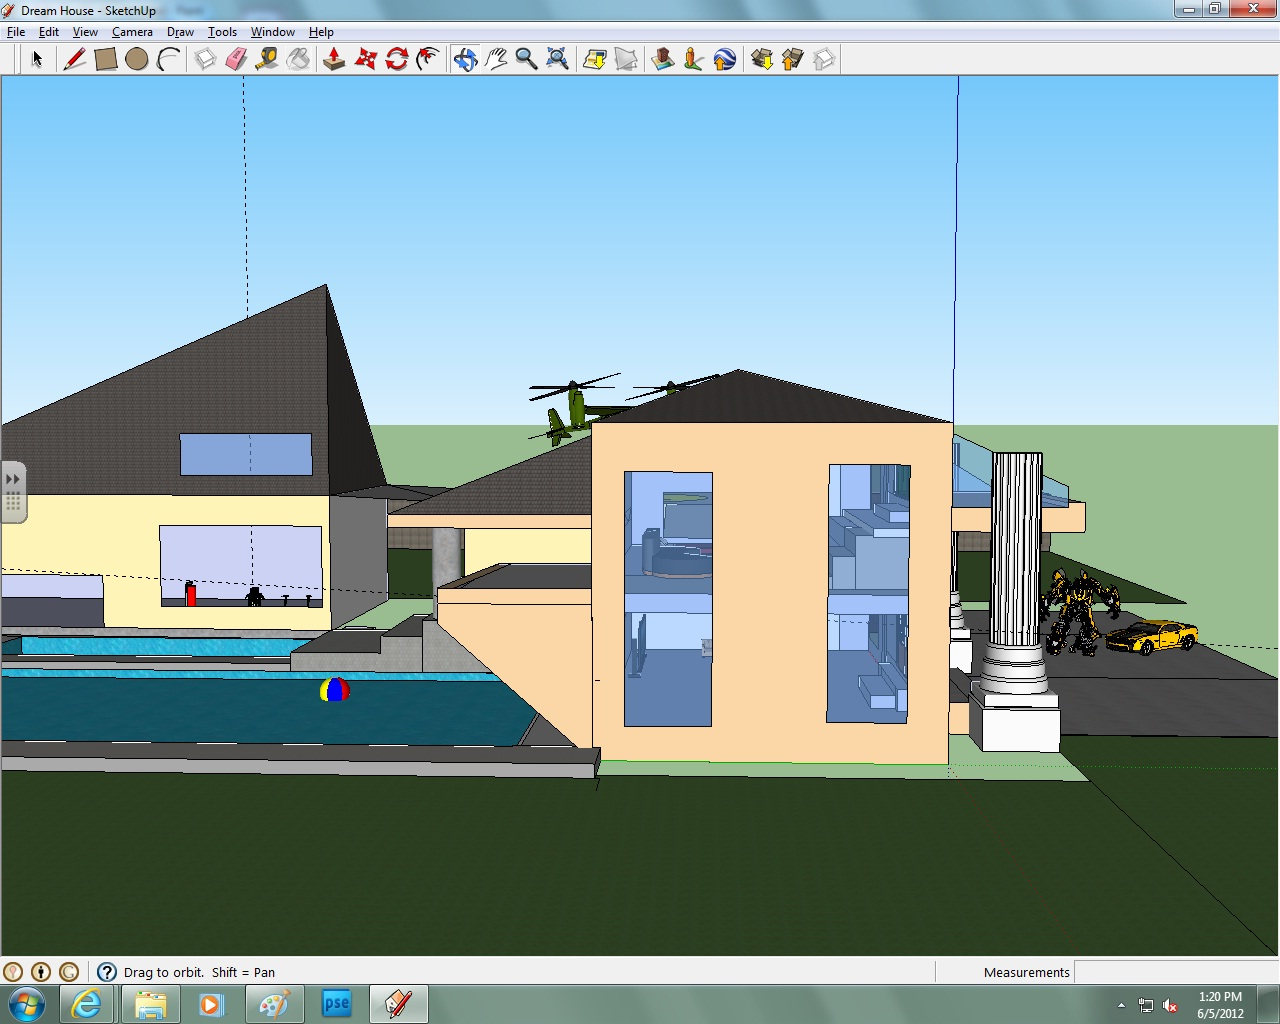 Awsaf 39 s blog my dream house for Building our dream home blog